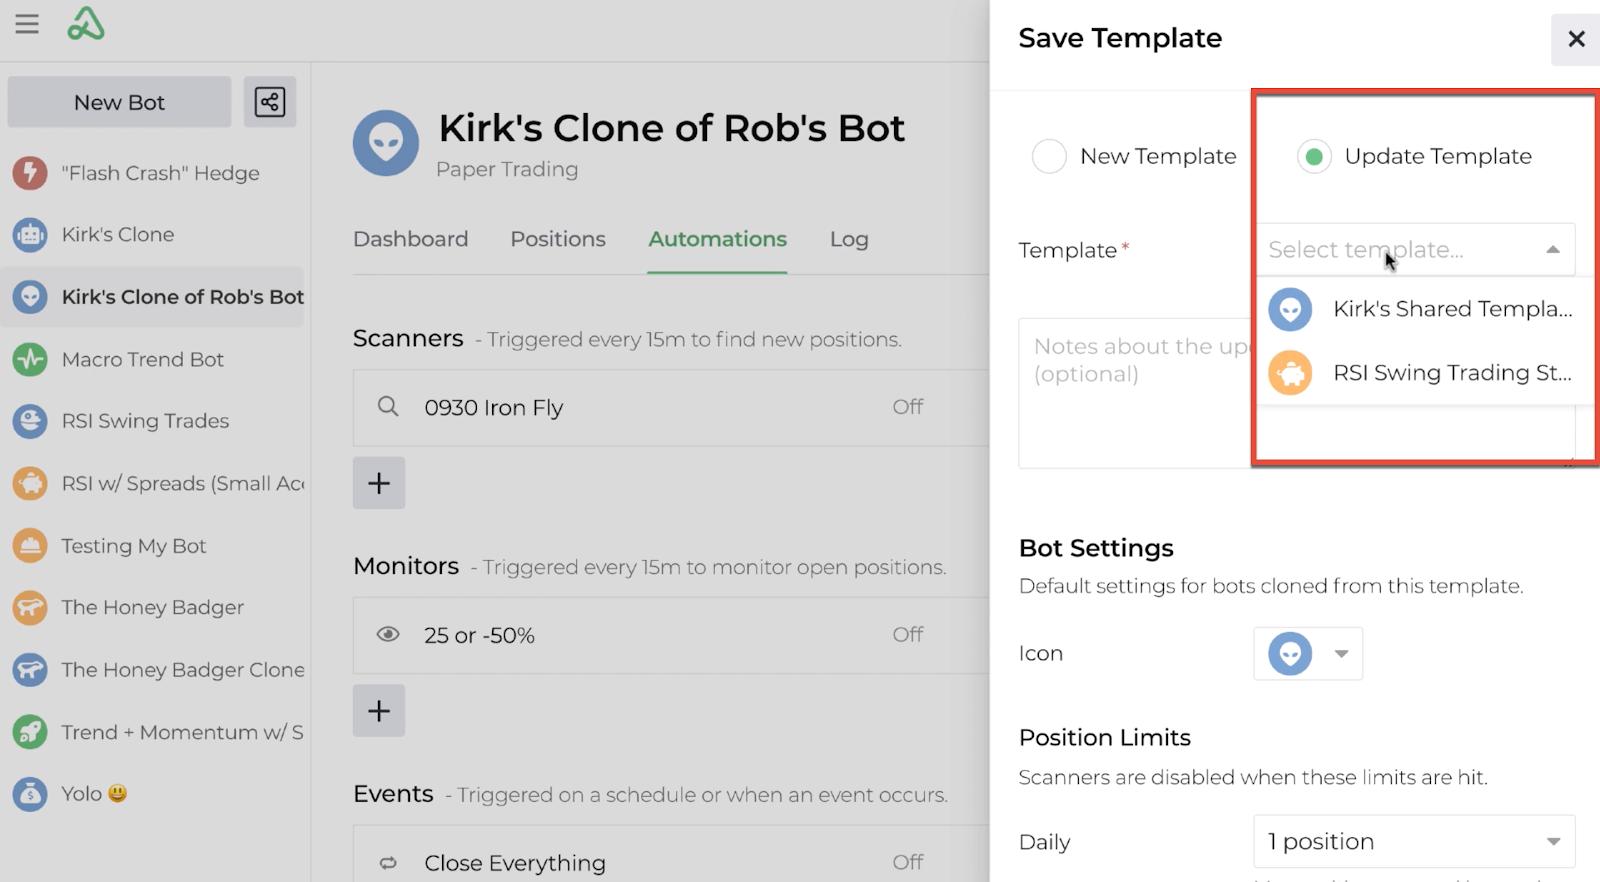 Screenshot of the save template display